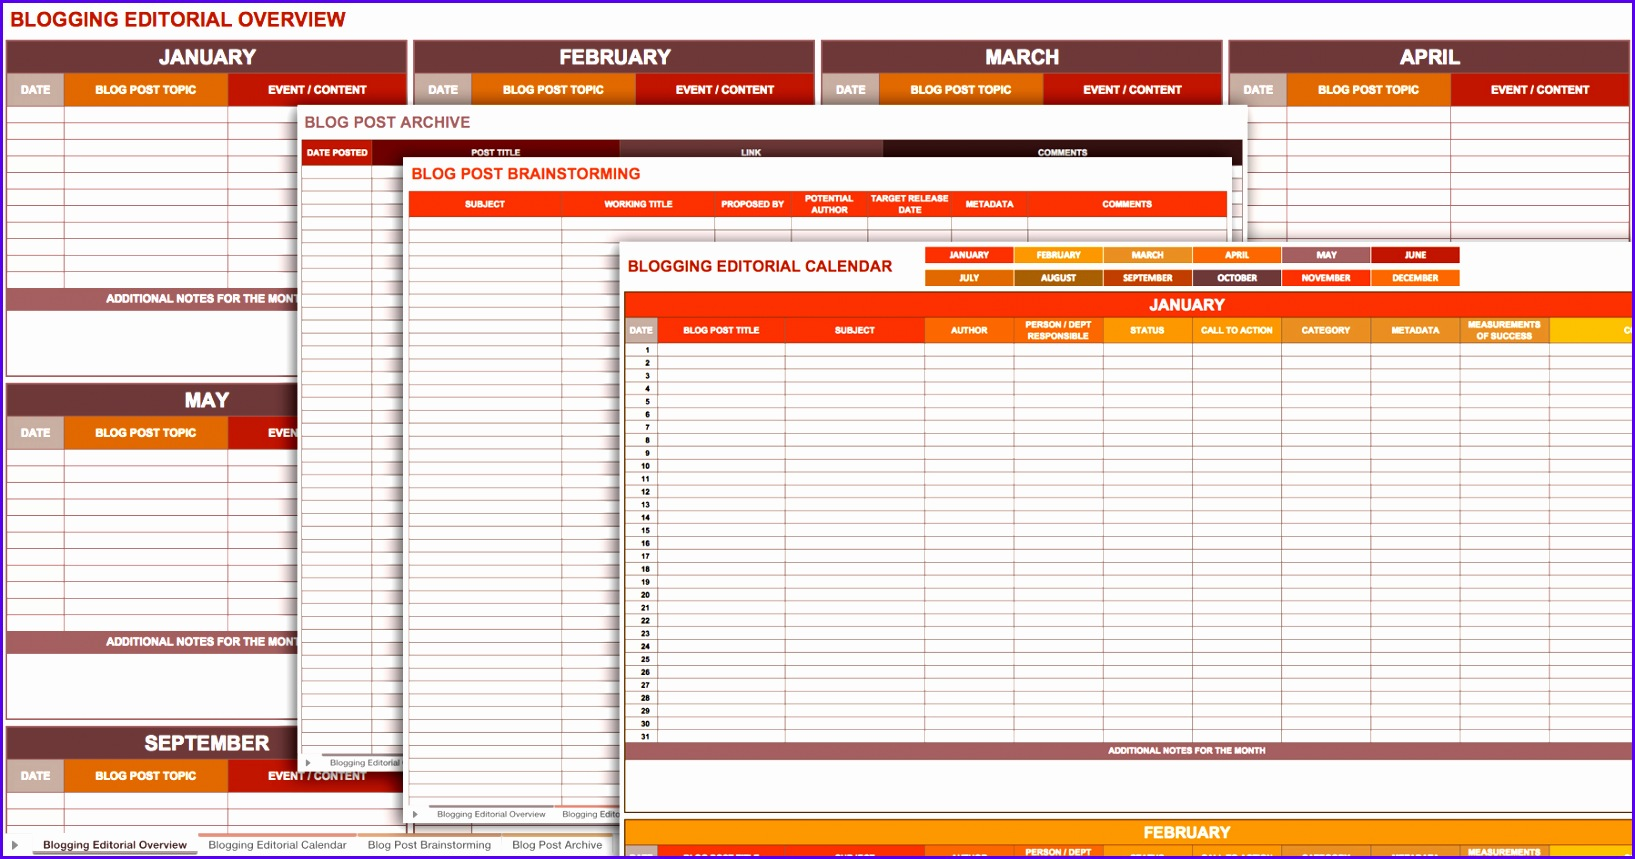 Blogging Editorial Calendar Template 1635859